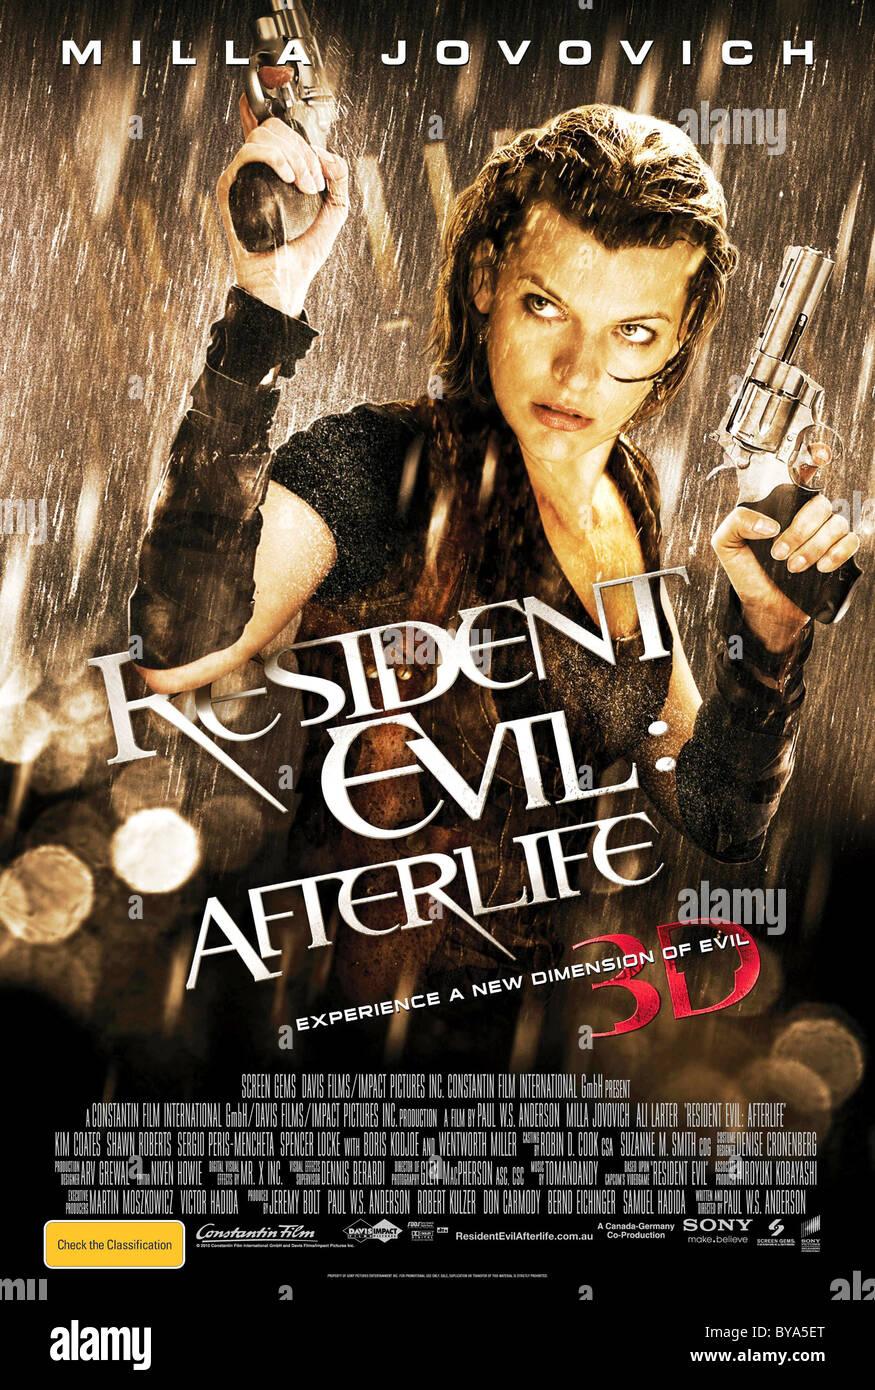 Resident Evil : Afterlife Anno : 2010 USA / UK Direttore : Paul W.S. Anderson Milla Jovovich film poster (USA) Immagini Stock